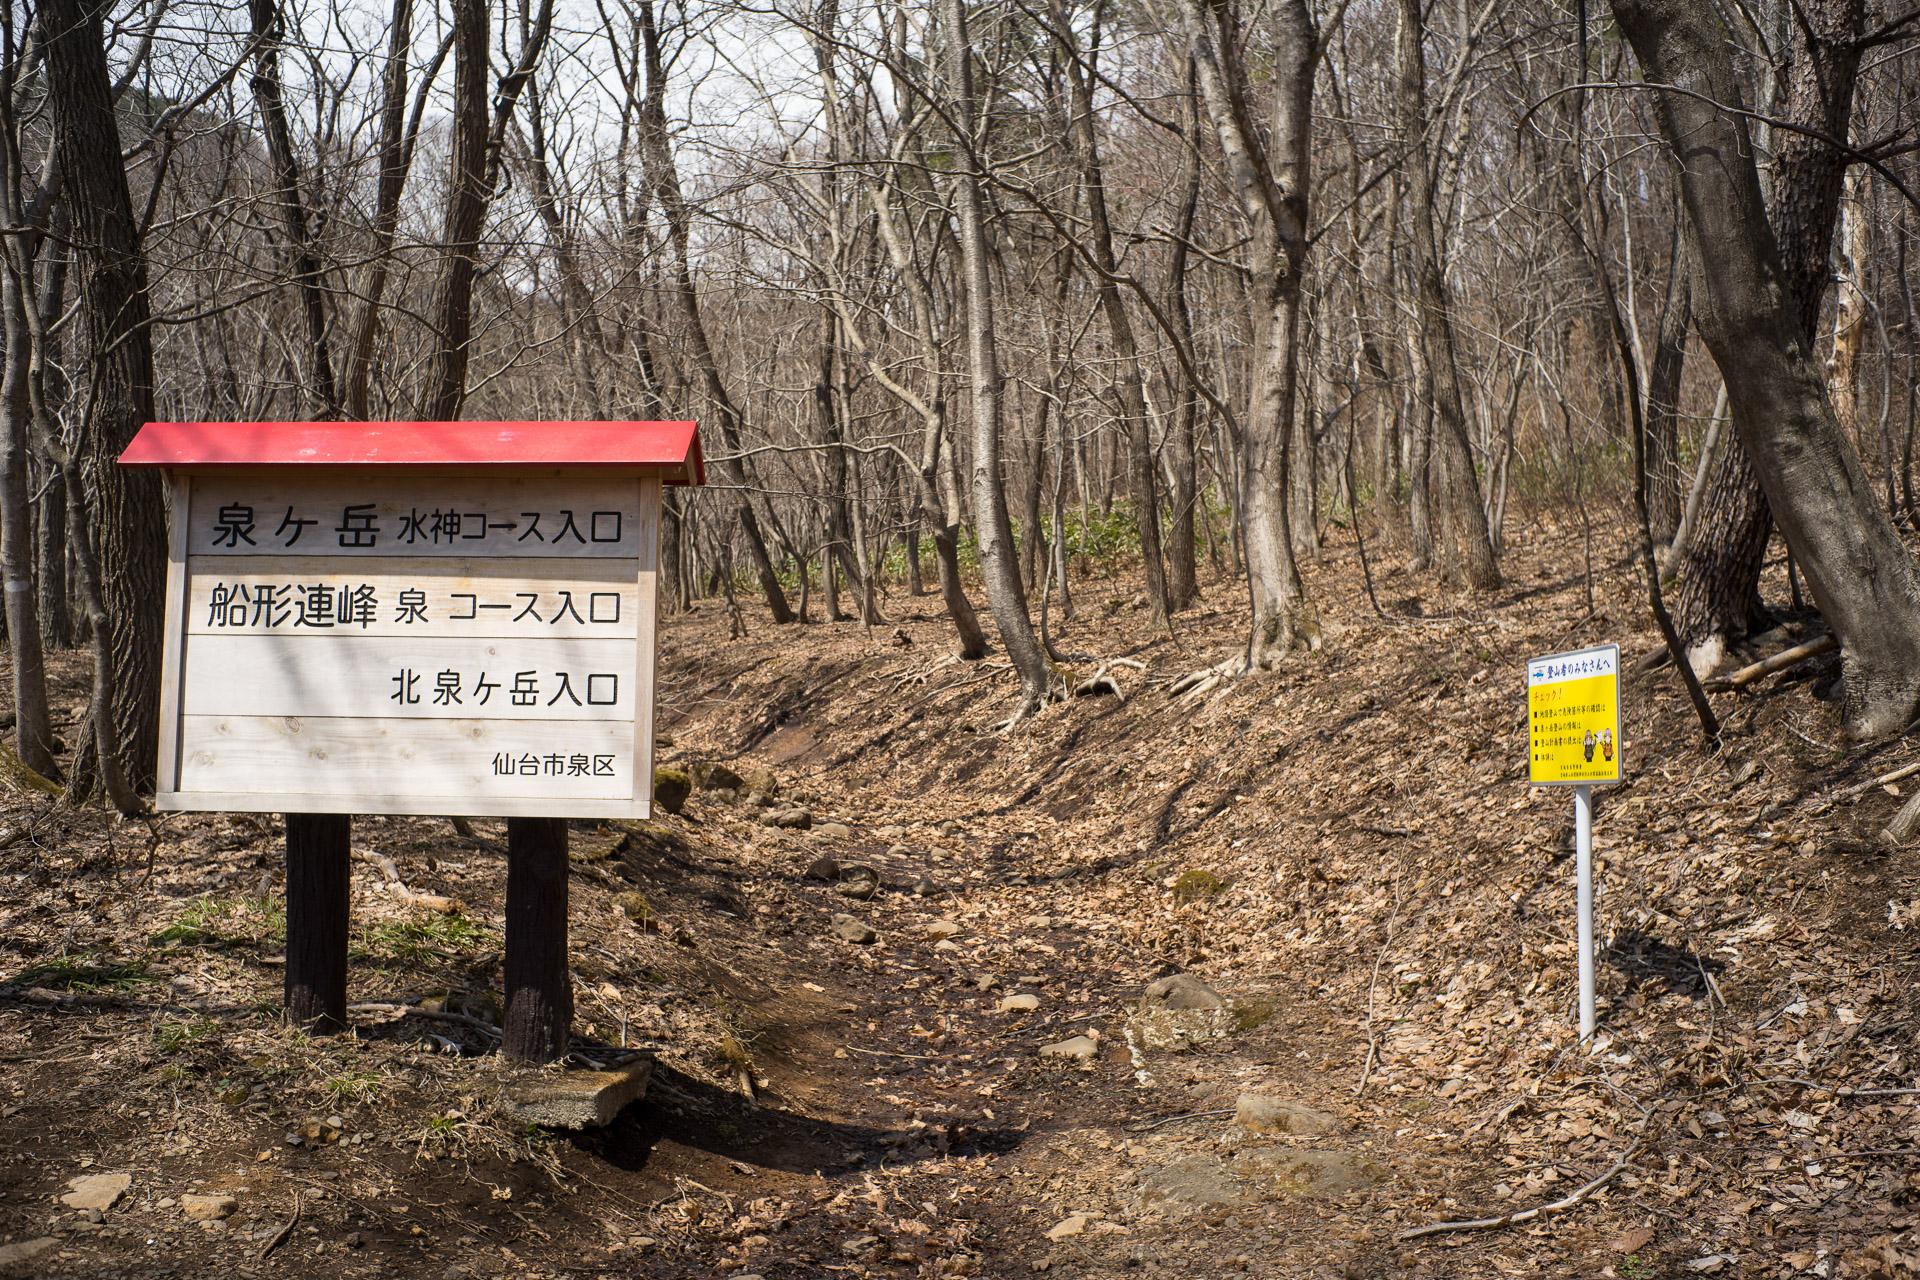 Izumigatake trail head